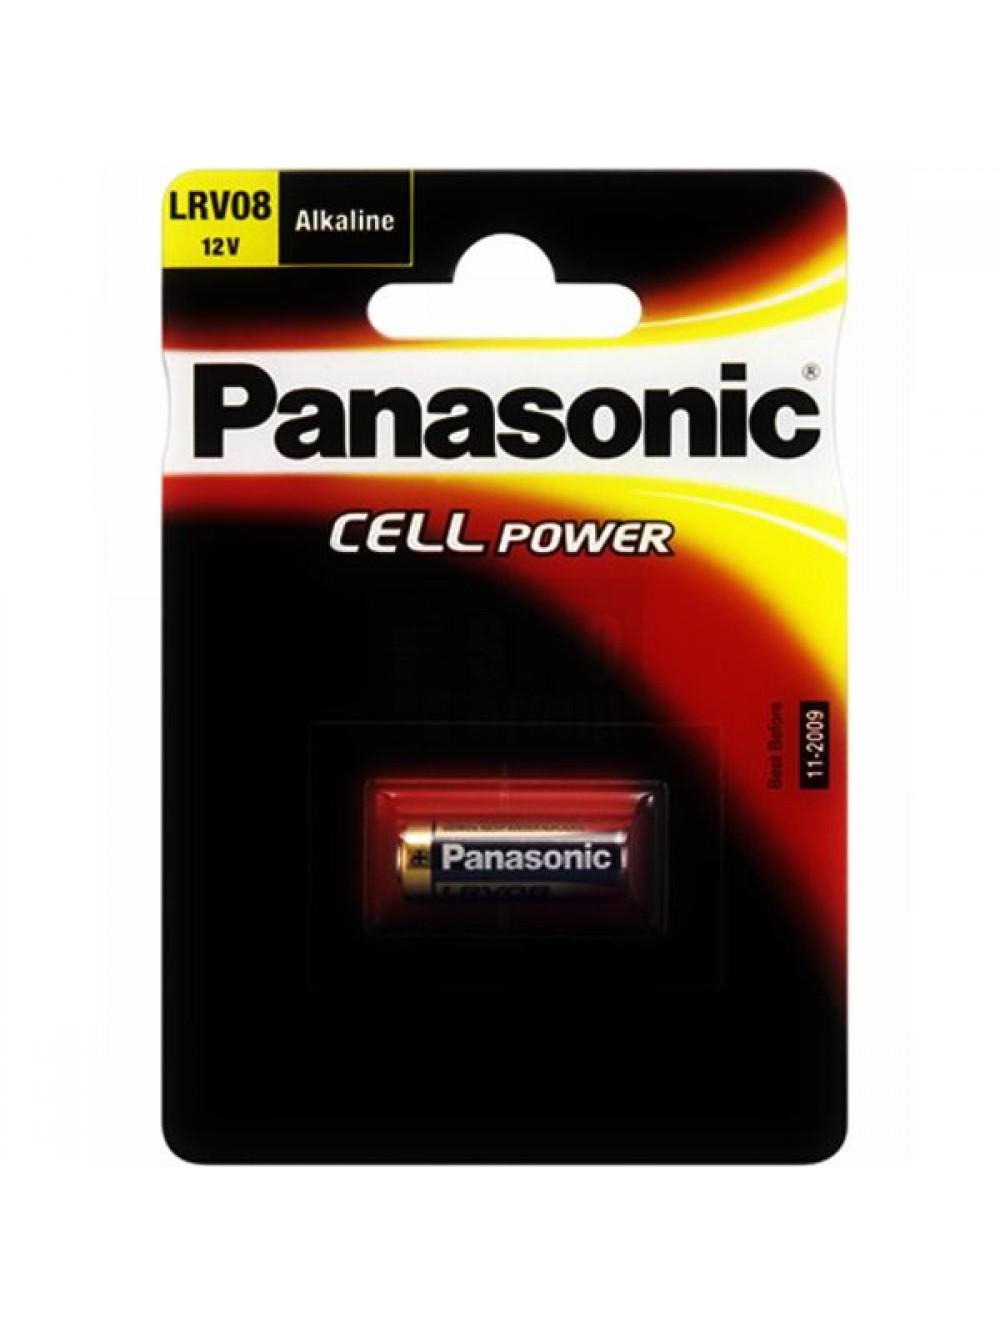 Panasonic Batterie Alkali Photo - - V 23 GA, LR 23, LRV 08, 4223